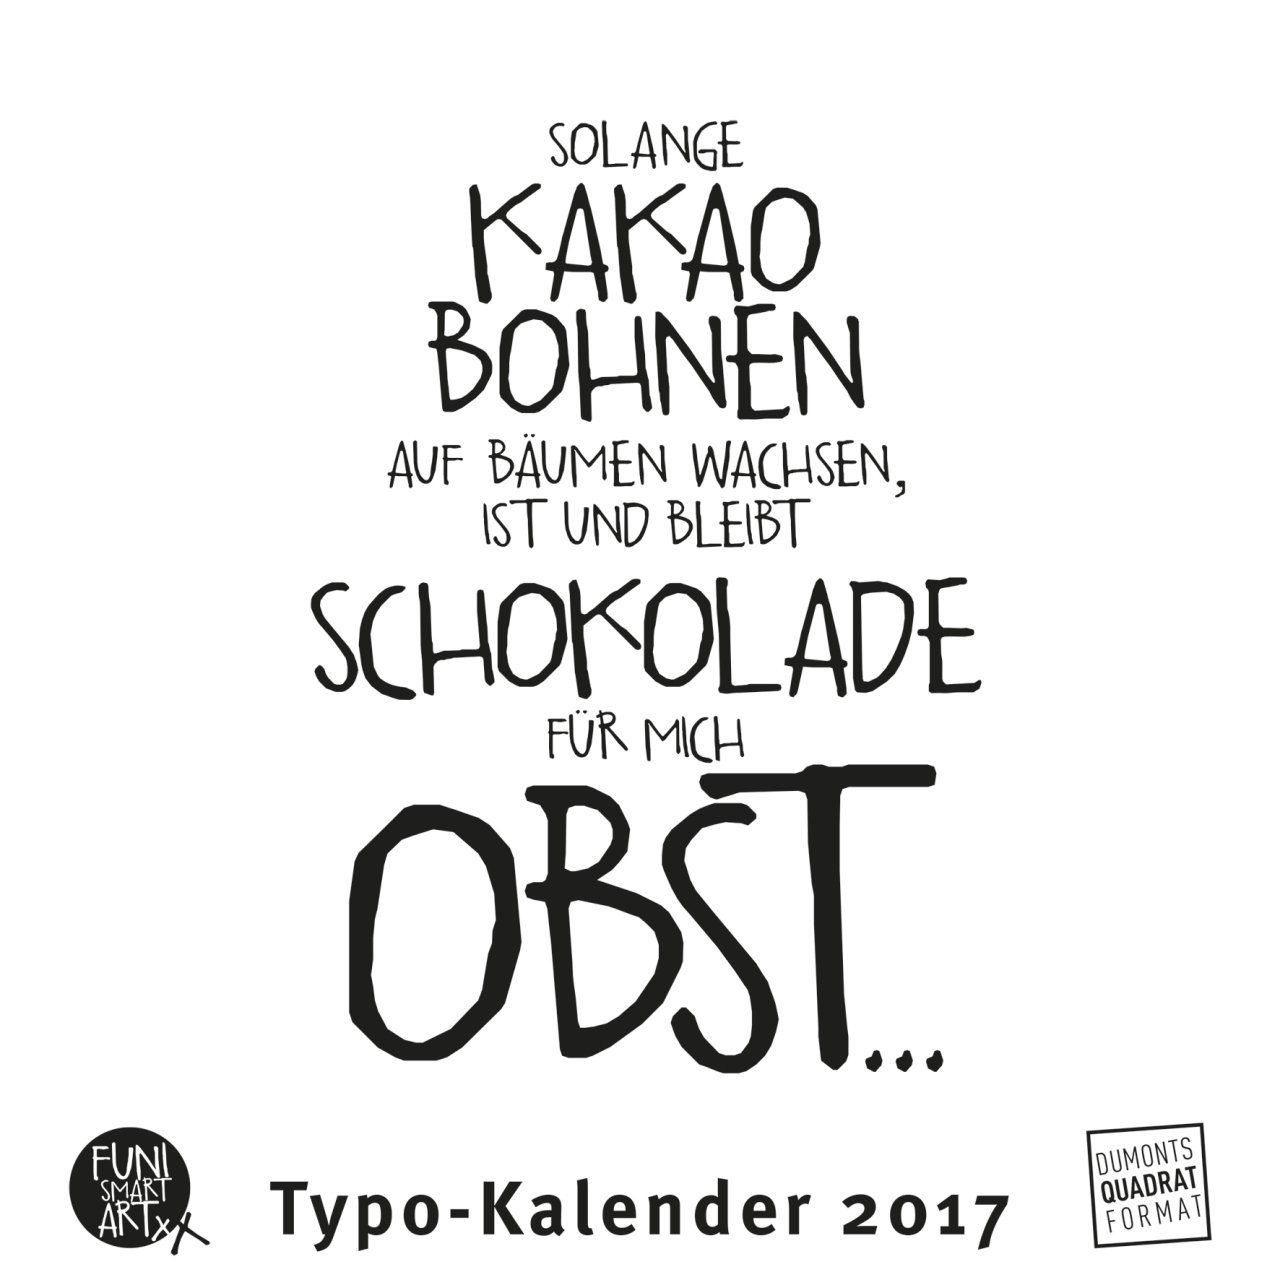 Großartig Zitate Arbeitsblatt Galerie - Mathe Arbeitsblatt ...